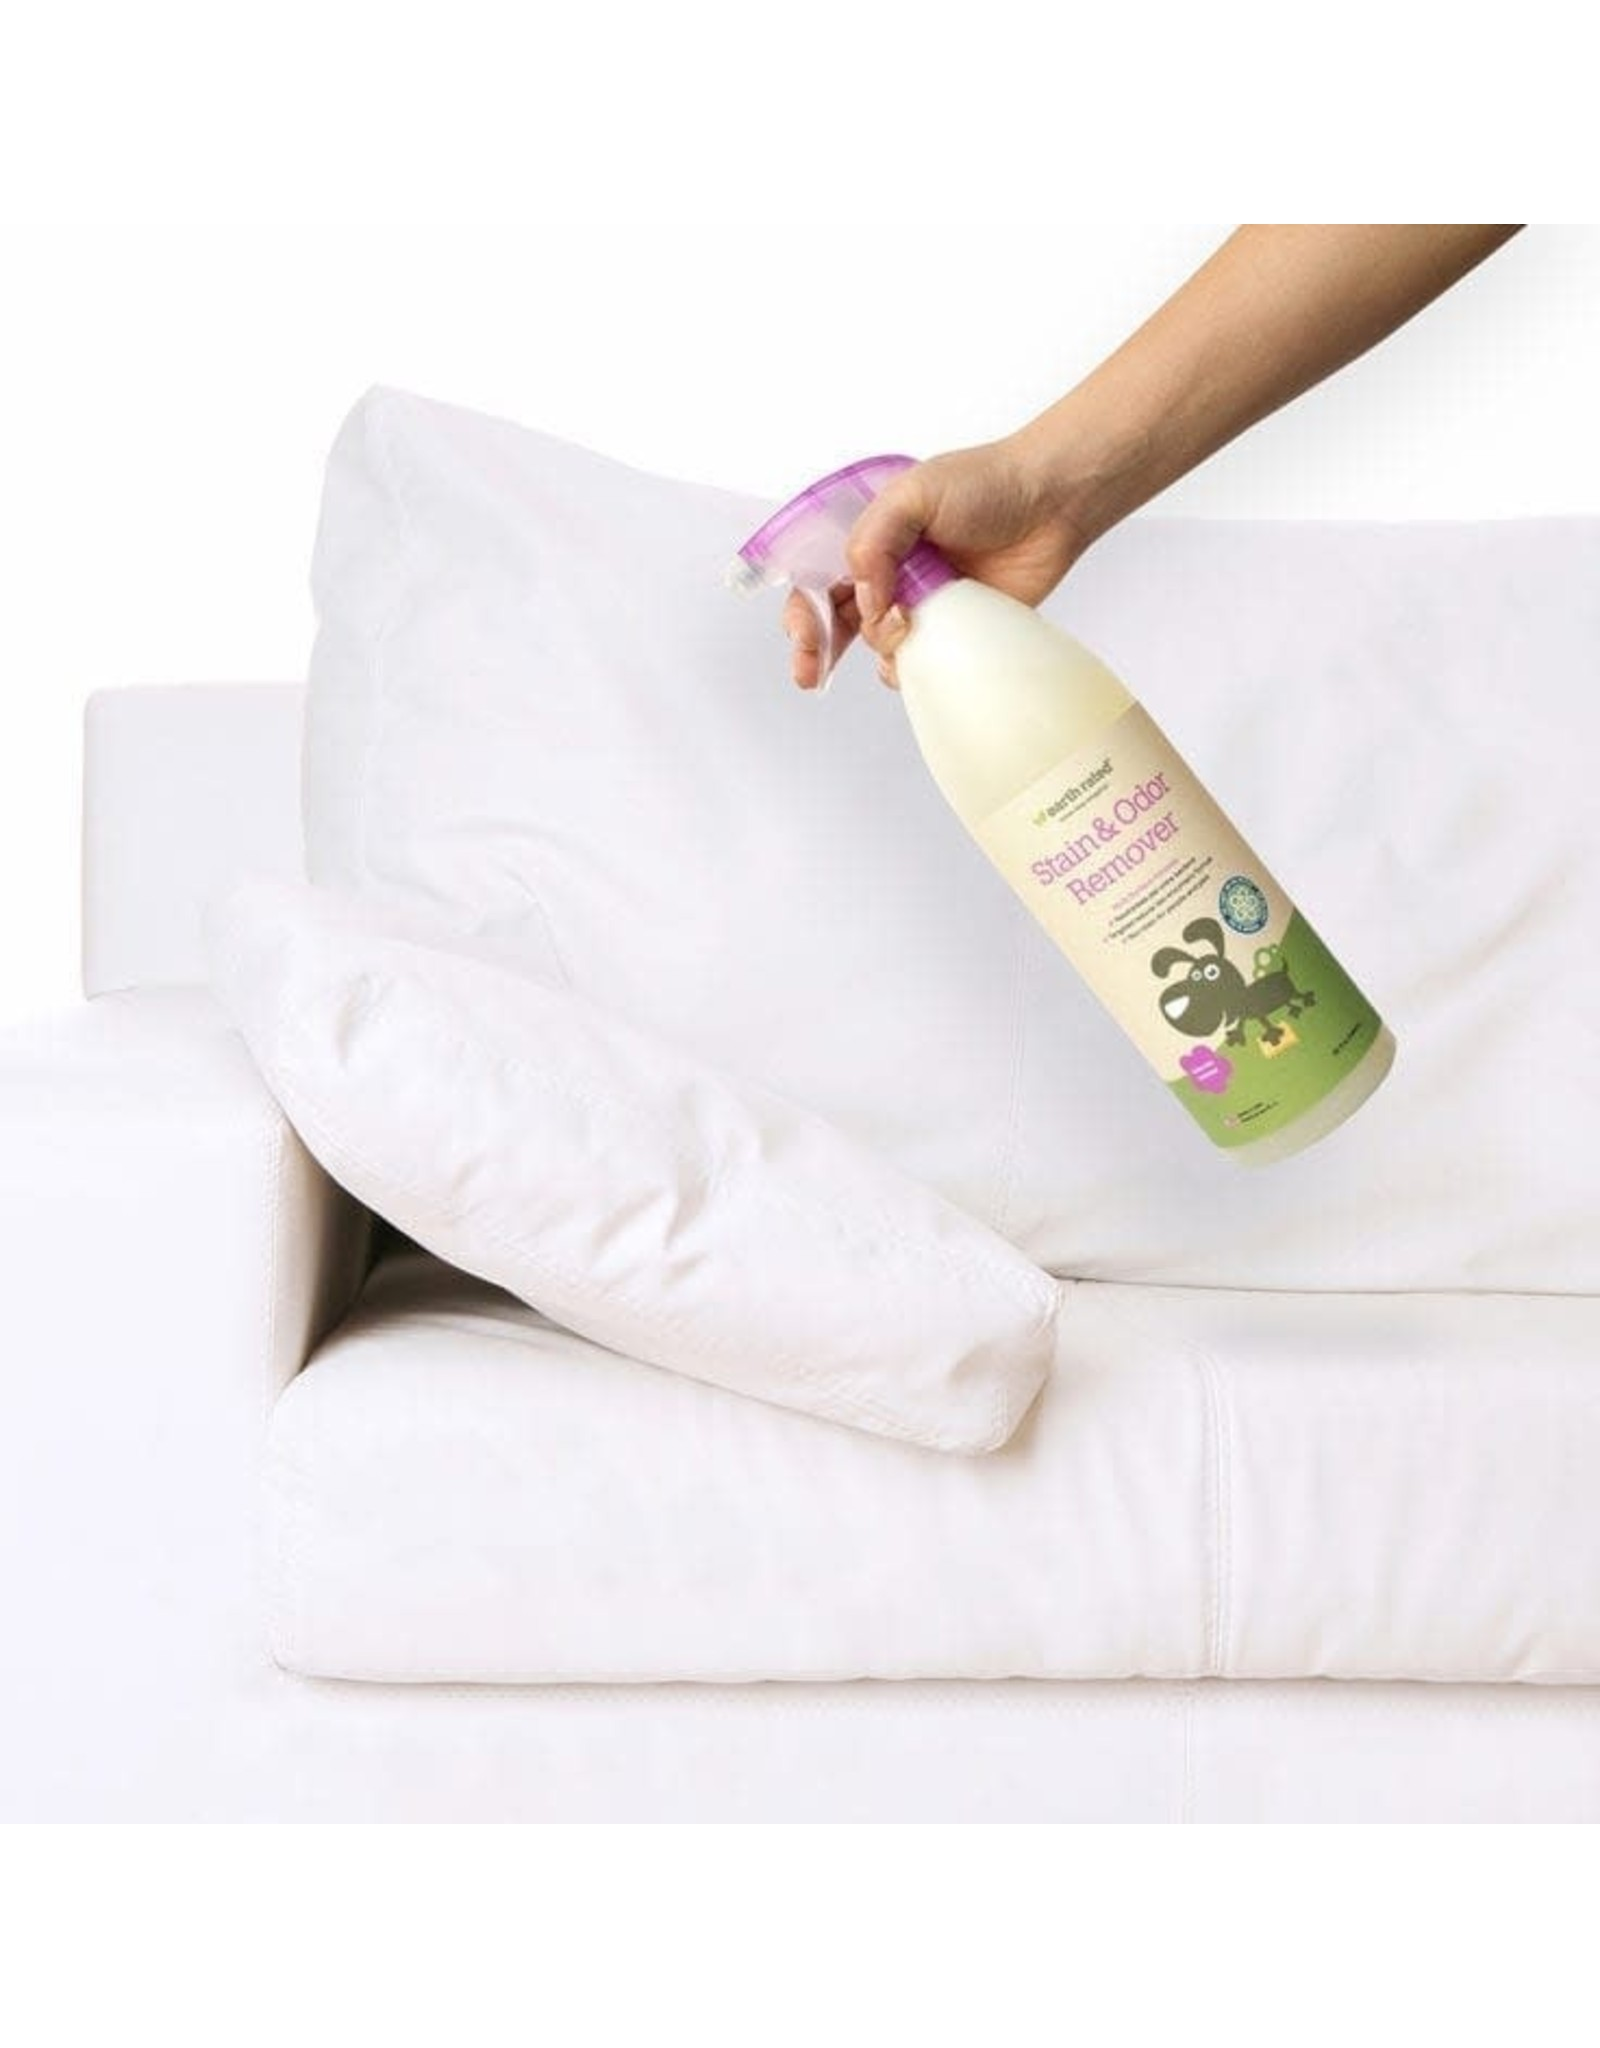 Stain & Odor Remover - Lavender Scented